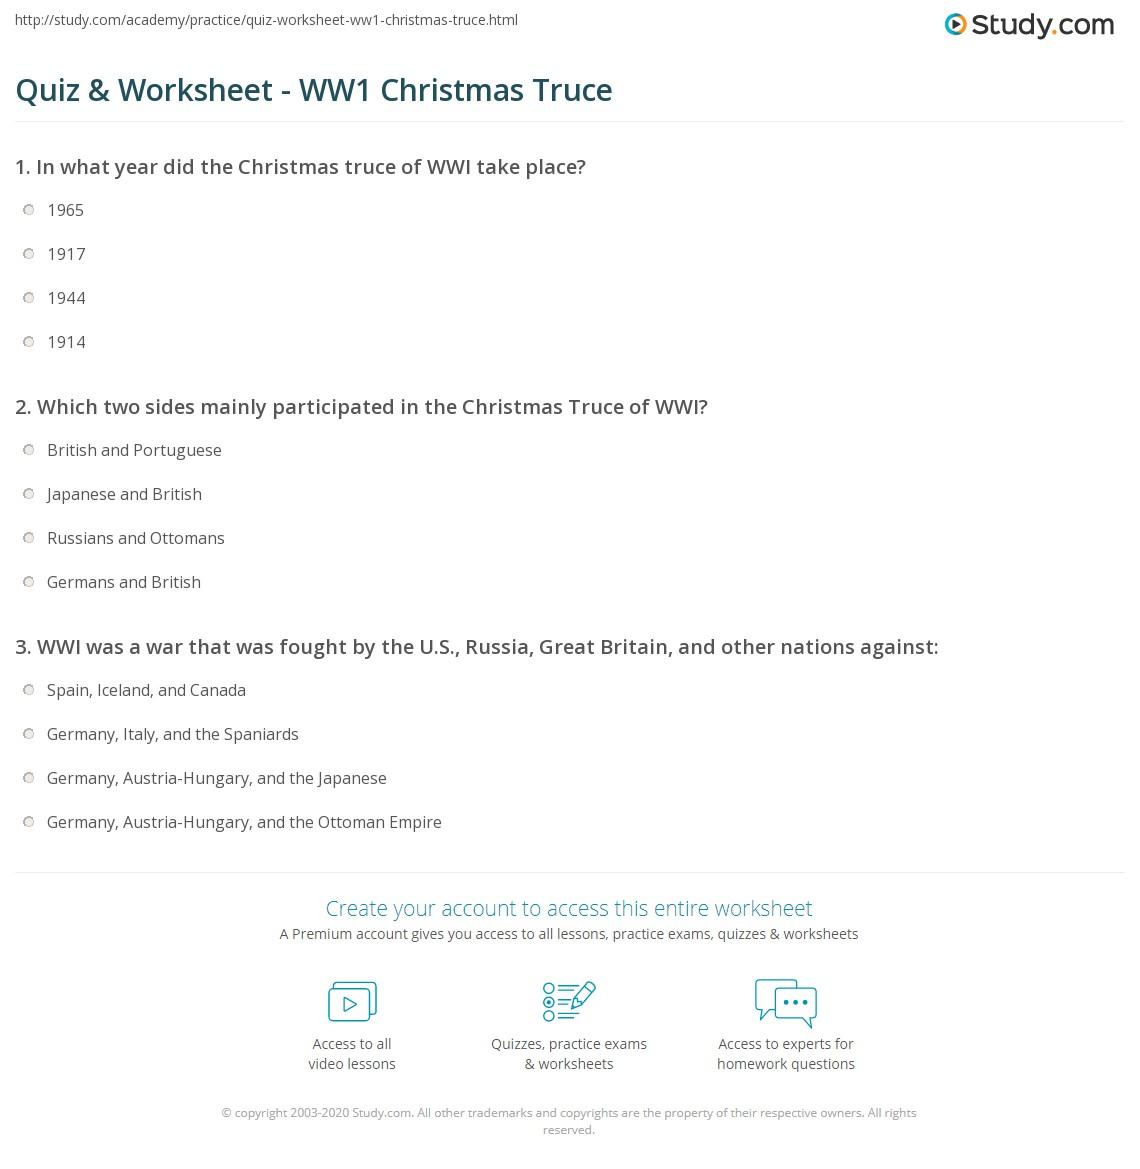 Quiz & Worksheet - WW1 Christmas Truce | Study.com